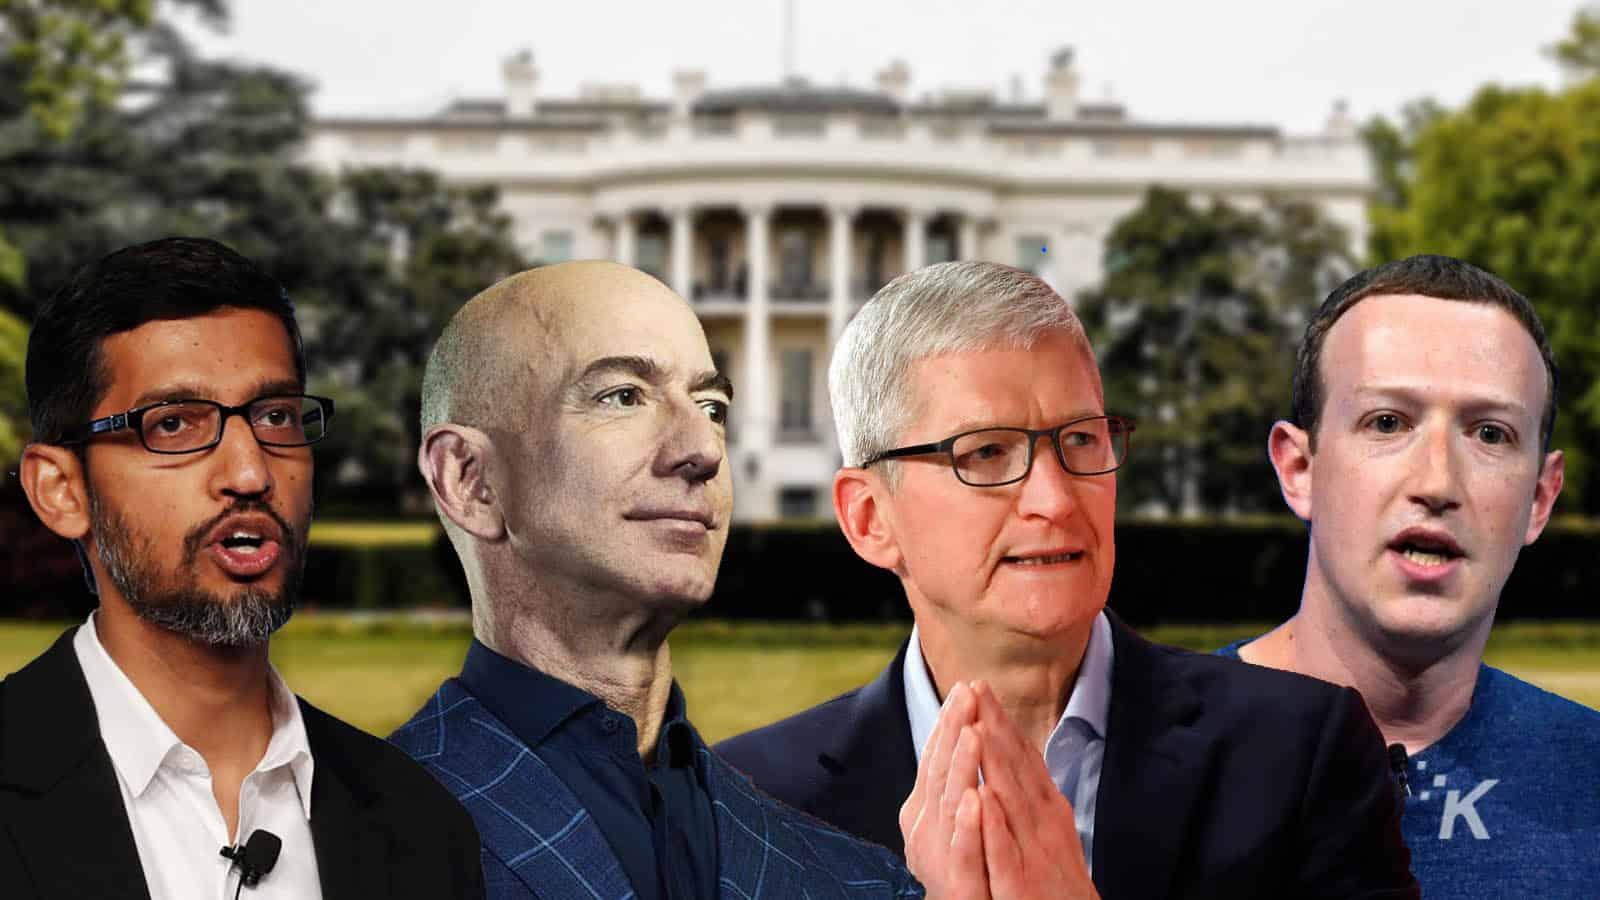 big tech ceos from facebook, amazon, google, apple